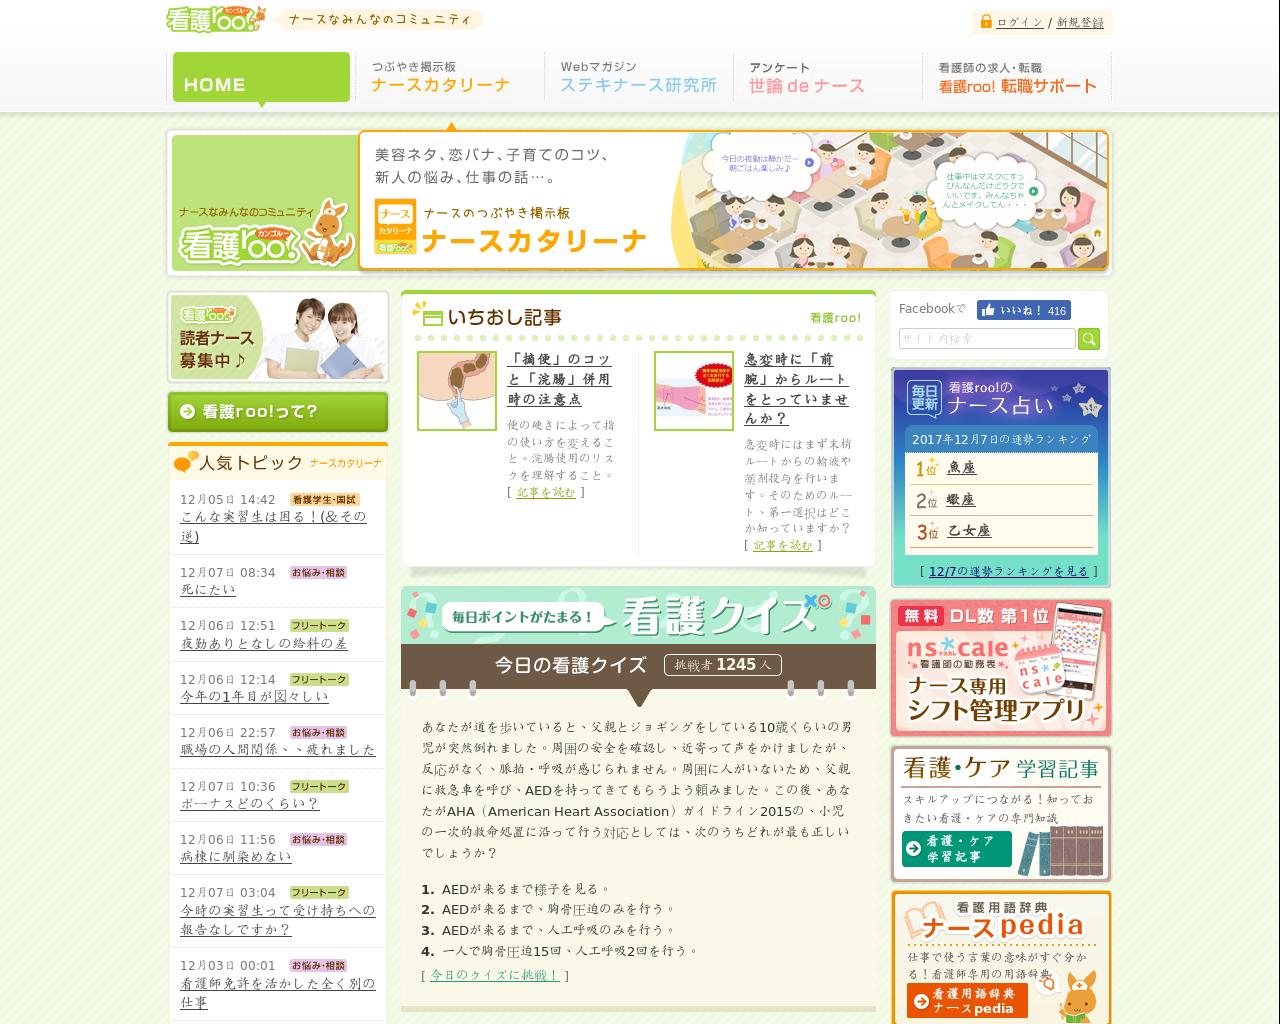 www.kango-roo.com(2017/12/07 05:30:36)